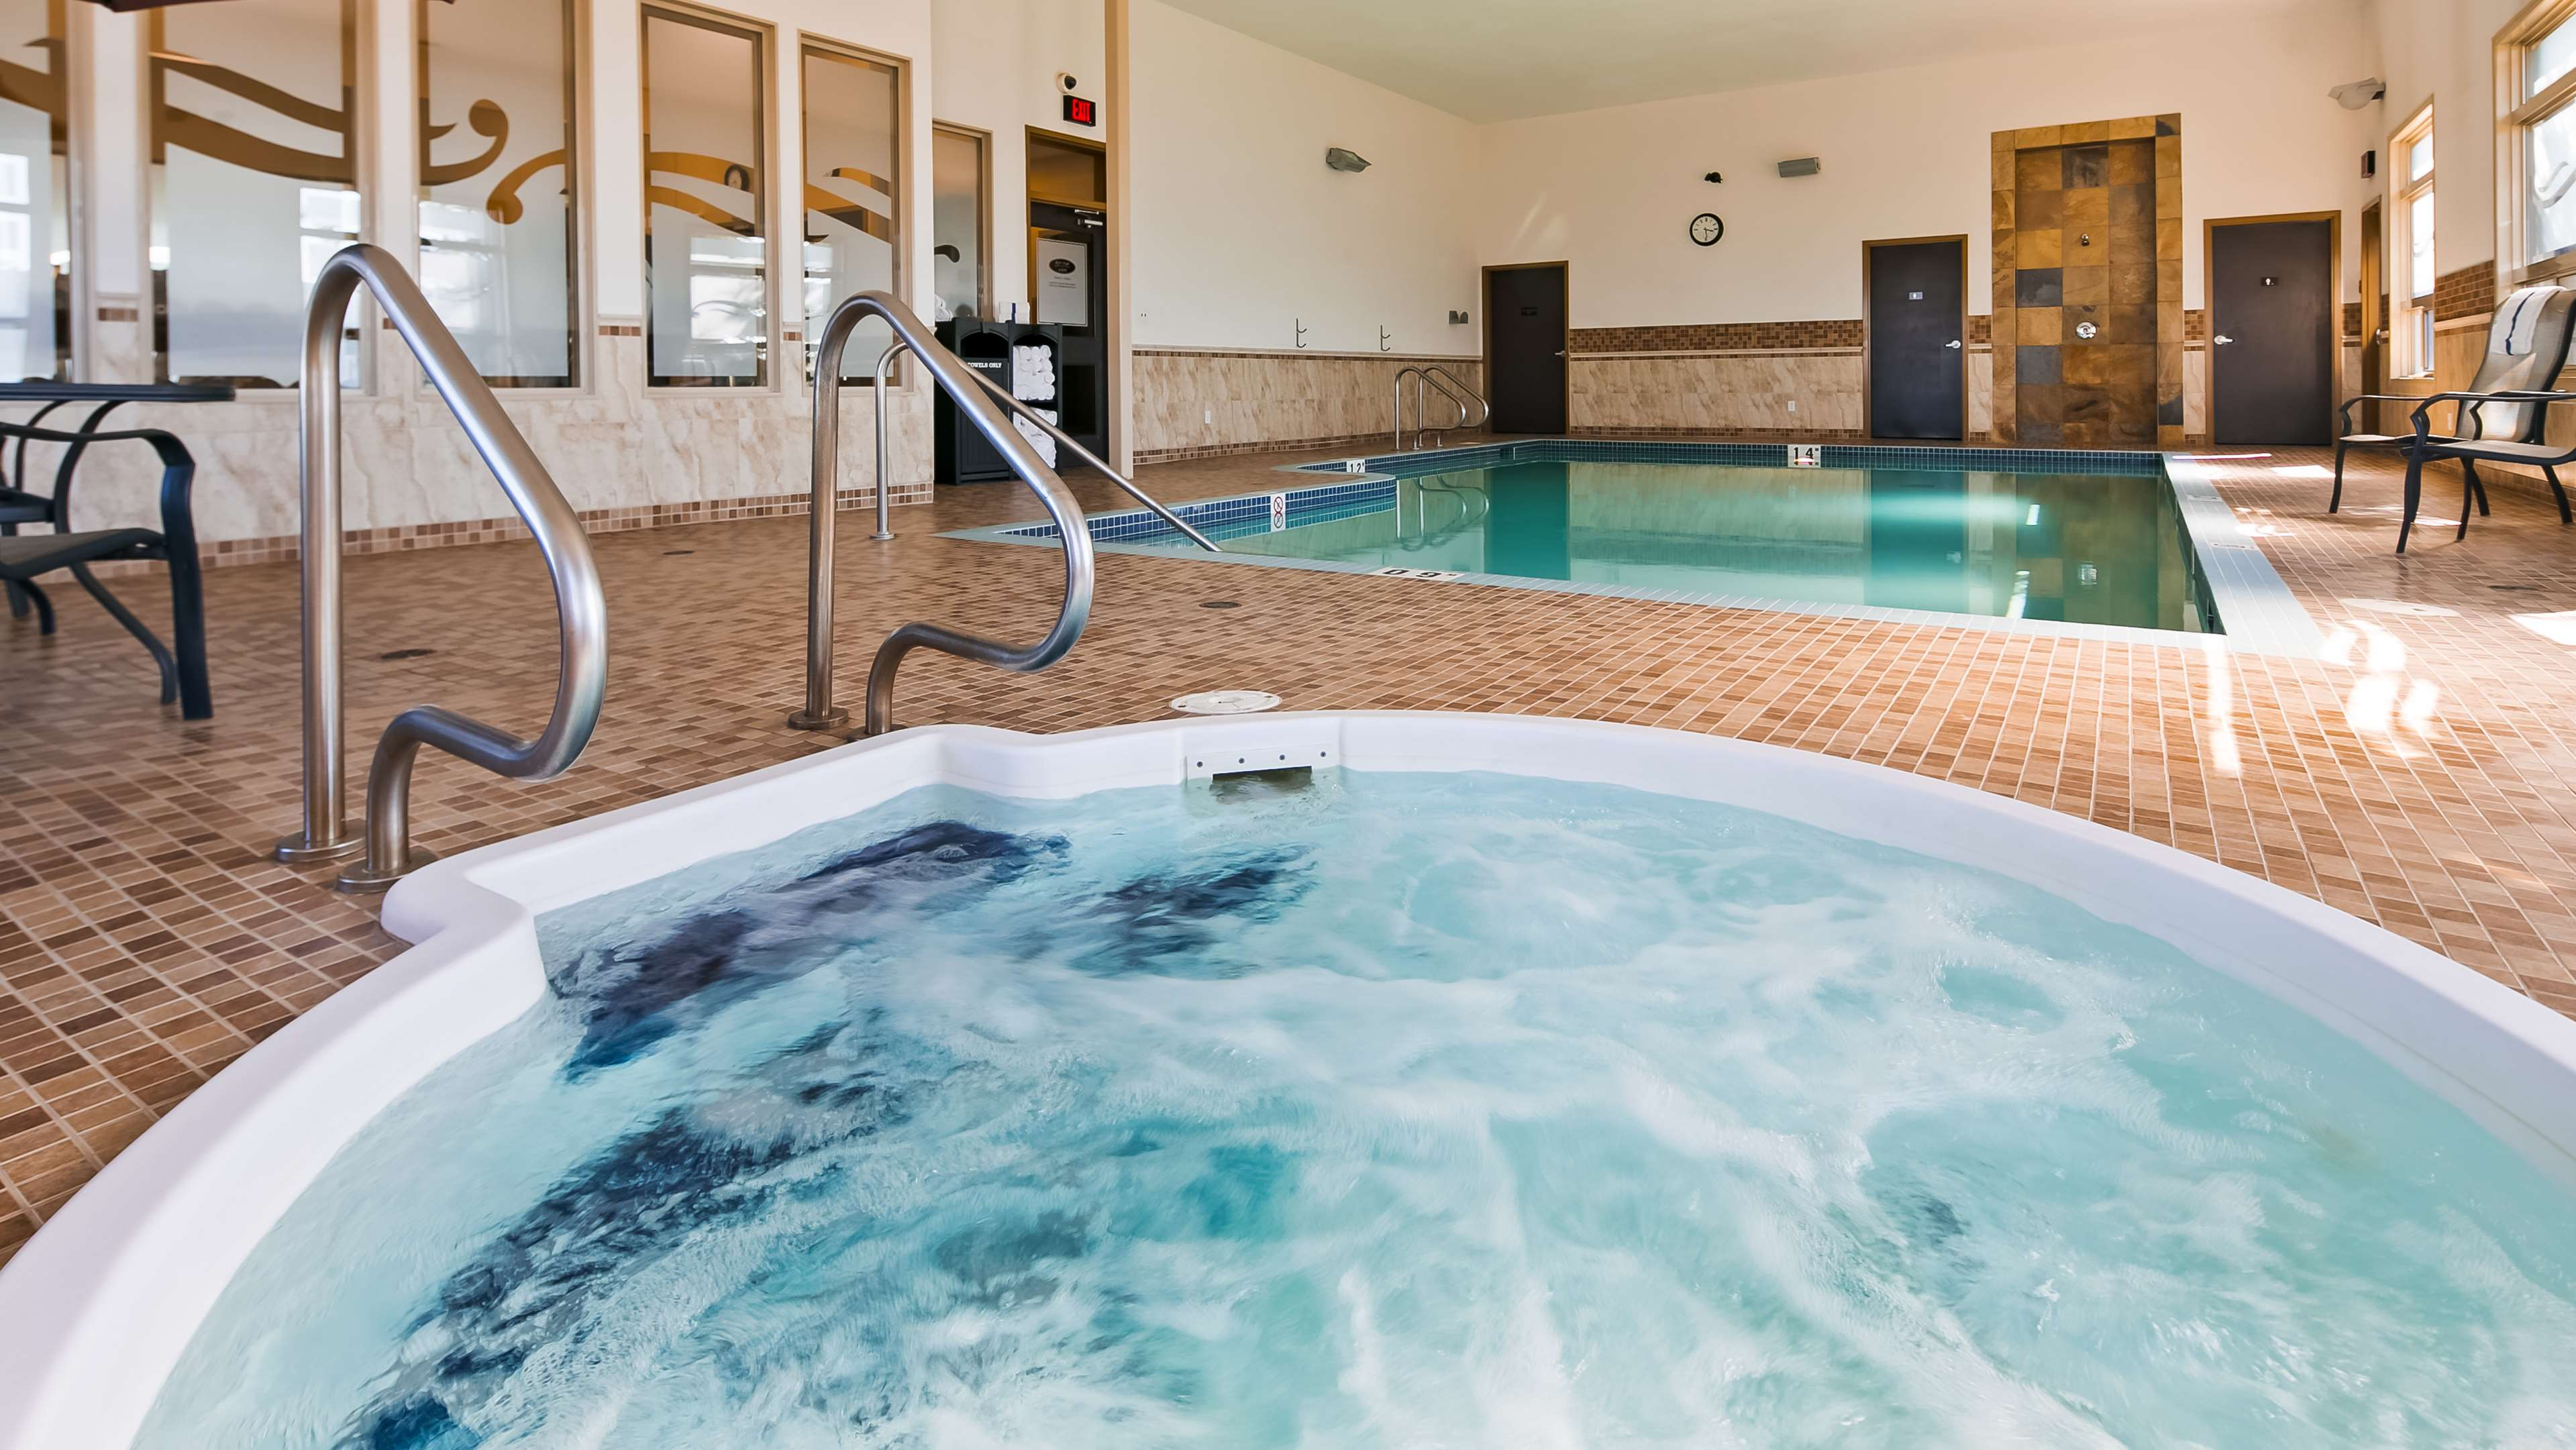 Indoor Pool Hot Tub Best Western Wainwright Inn & Suites Wainwright (780)845-9934